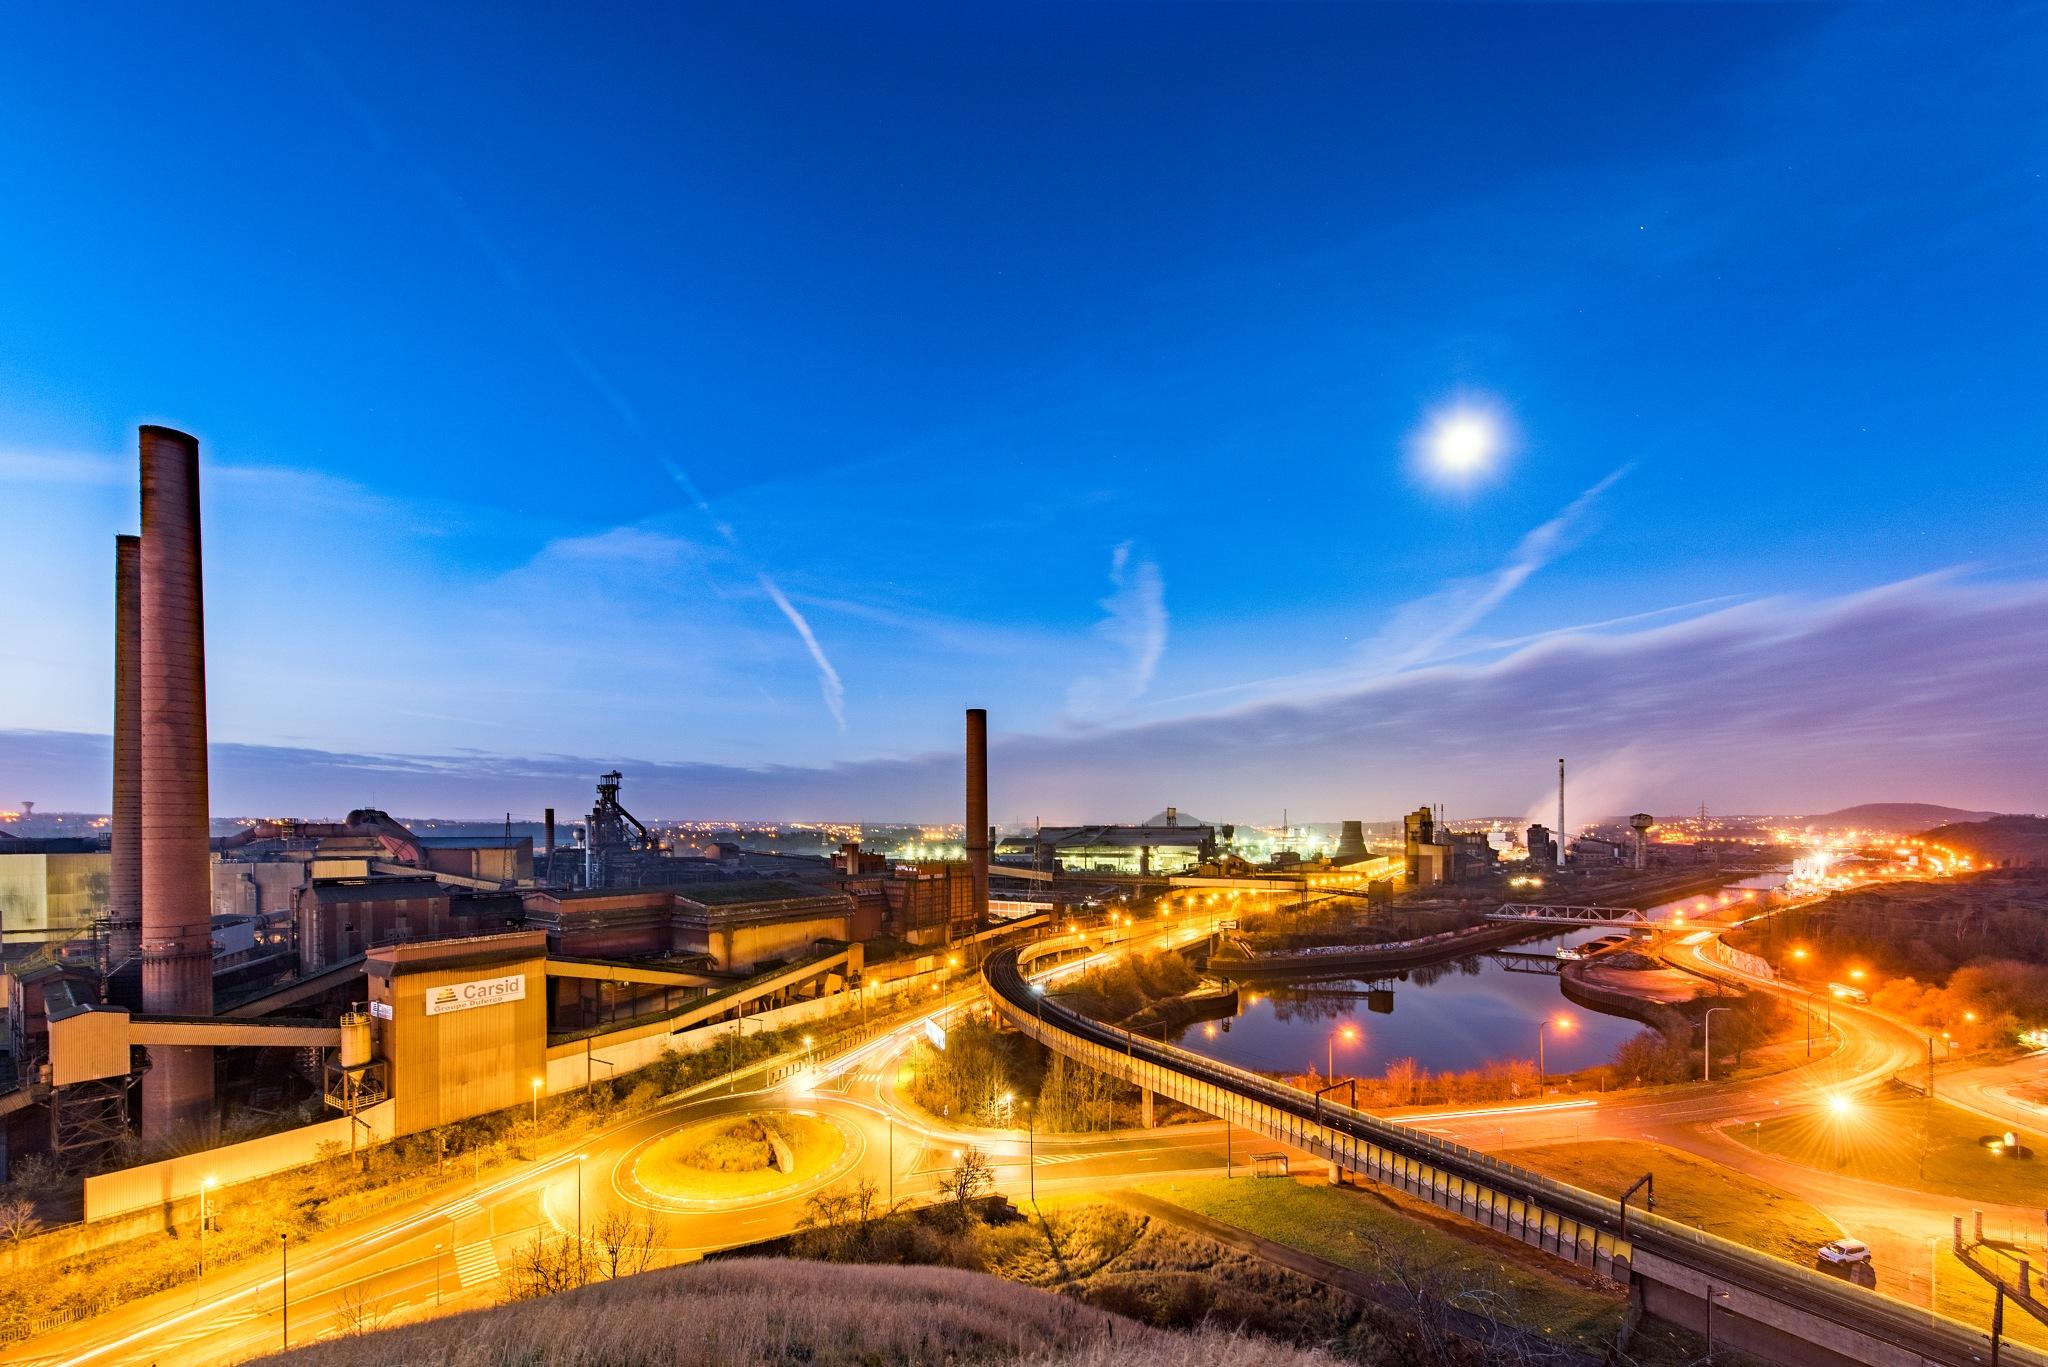 Heavy industrie by Bz Photo